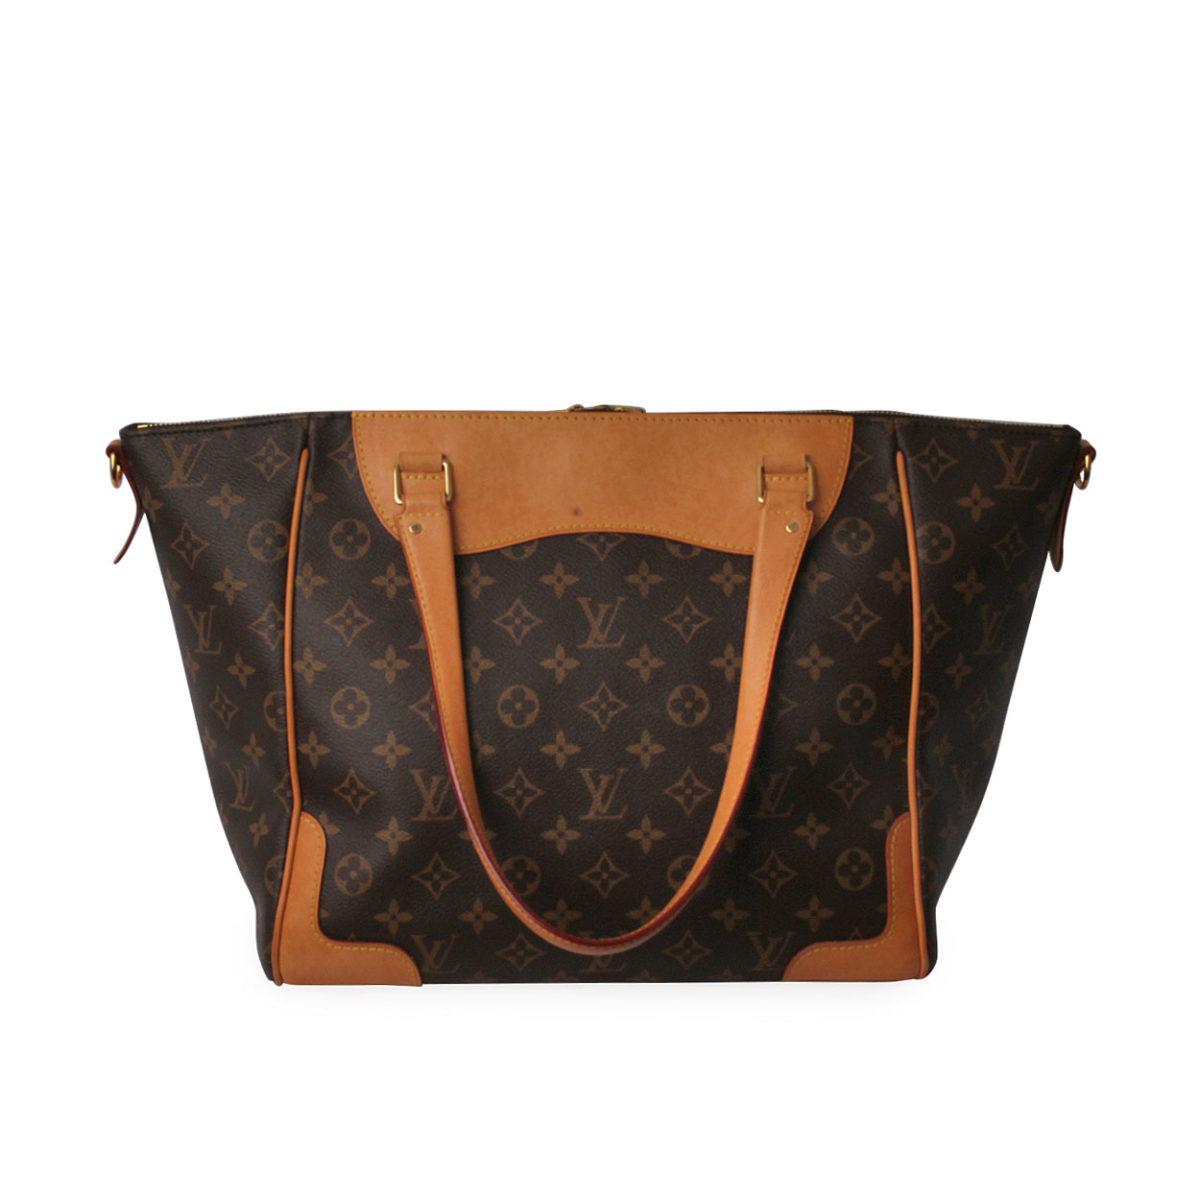 Louis Vuitton Monogram Estrela Mm Nm Luxity